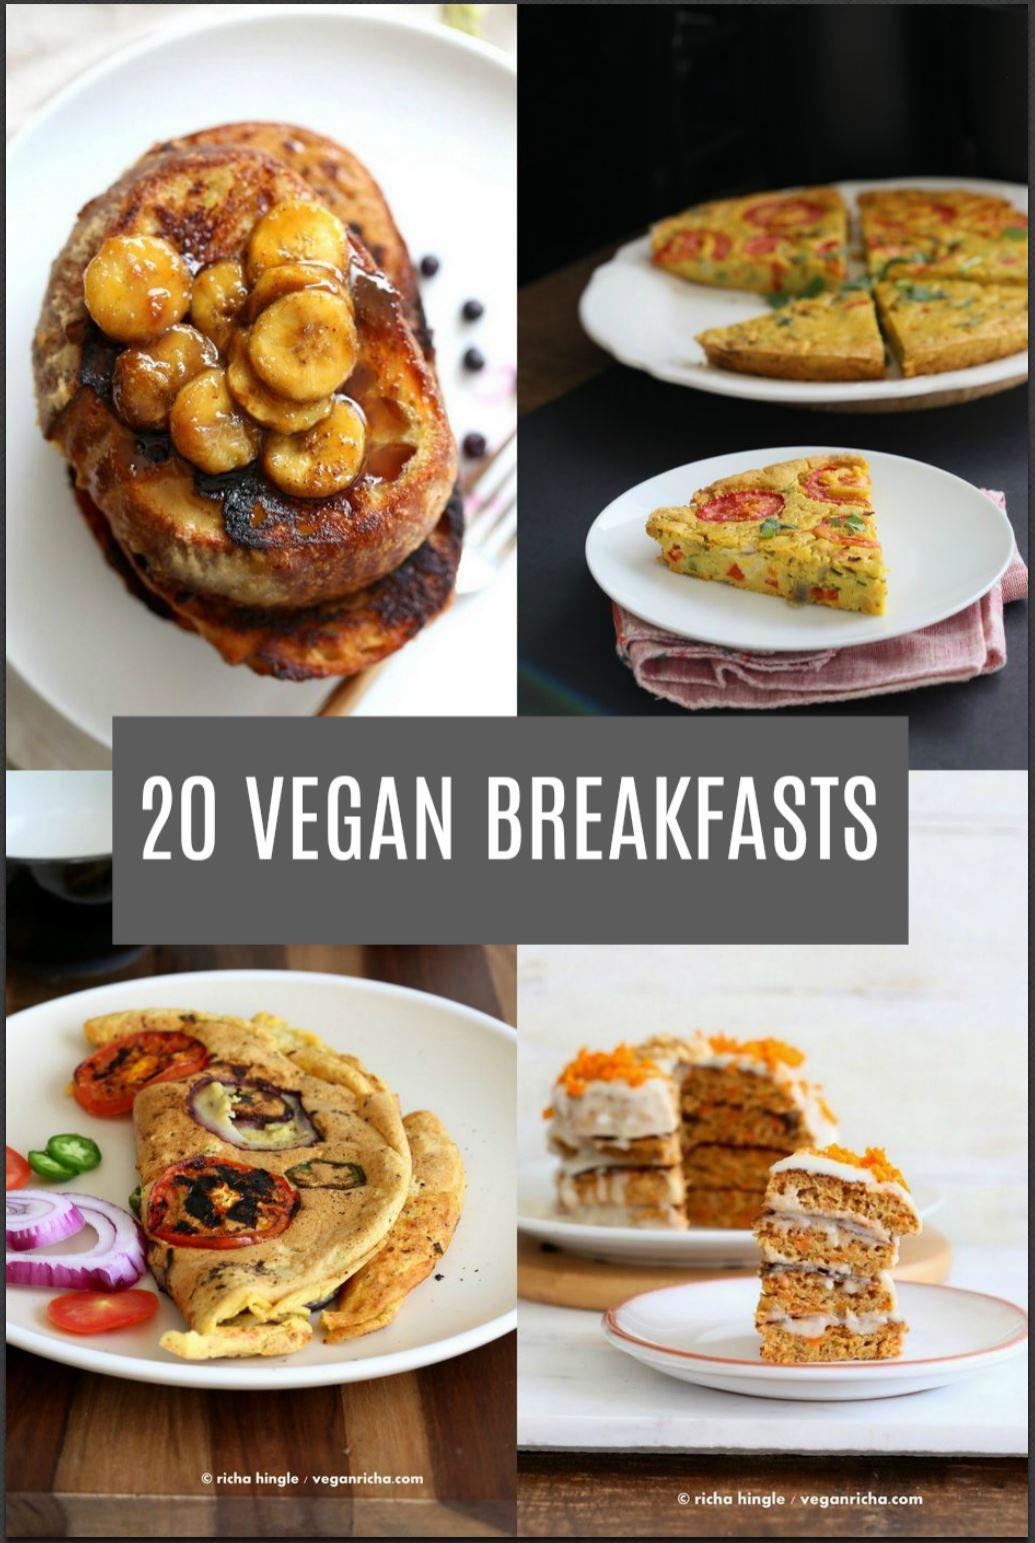 Breakfast Recipe Ideas  20 Vegan Breakfast Recipes Vegan Richa